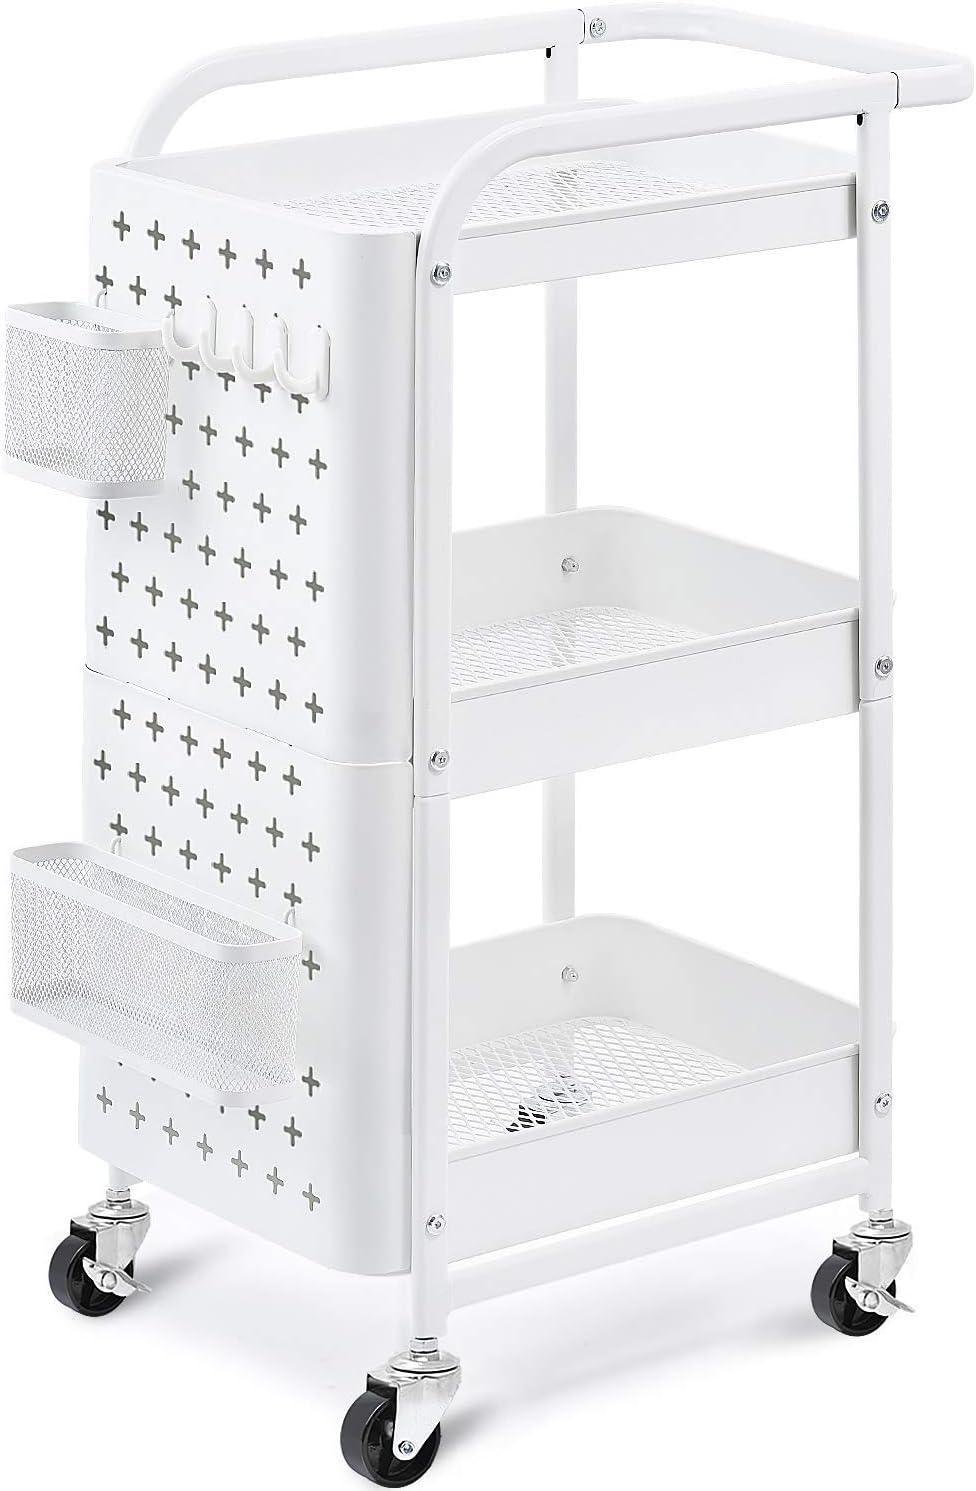 3//4 Tier Organizer Trolley Cart Utility Rolling Storage Rack Holders Space Saver